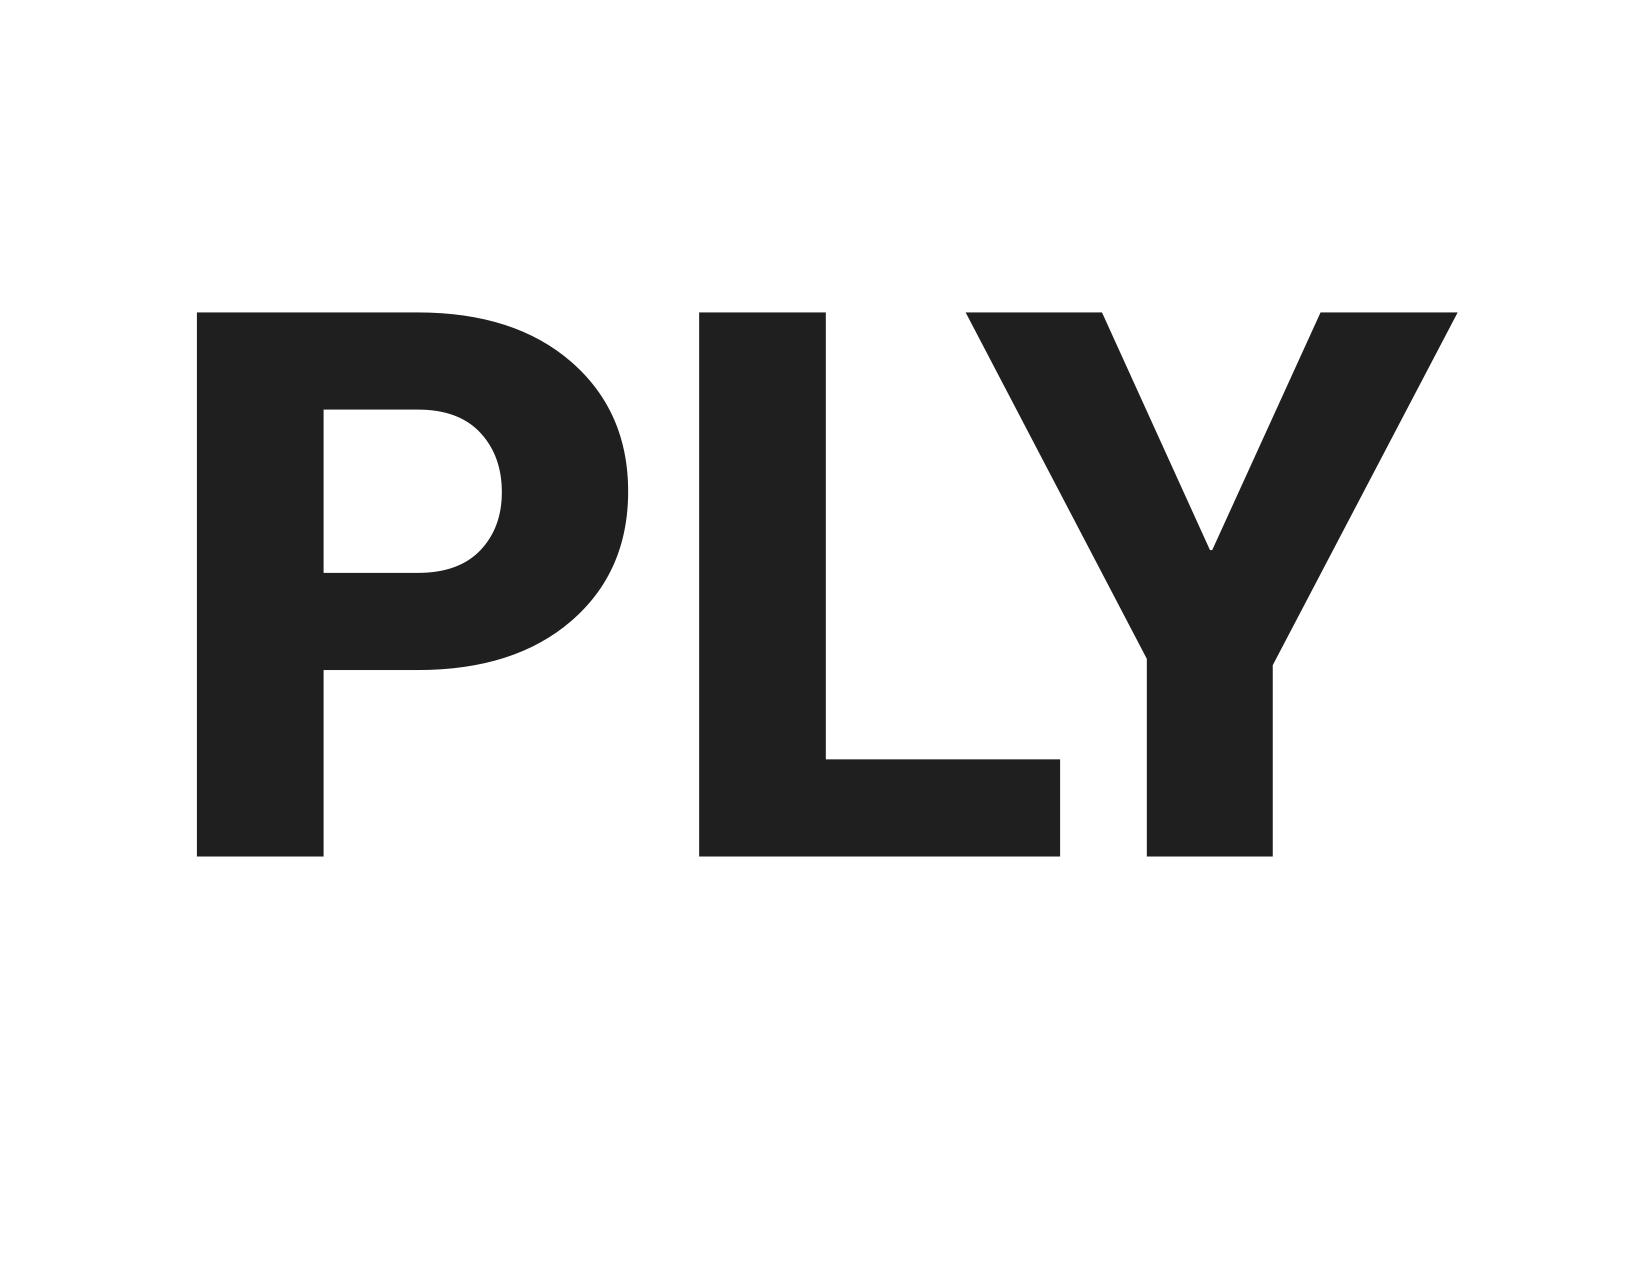 ply-ply428logo copy.png